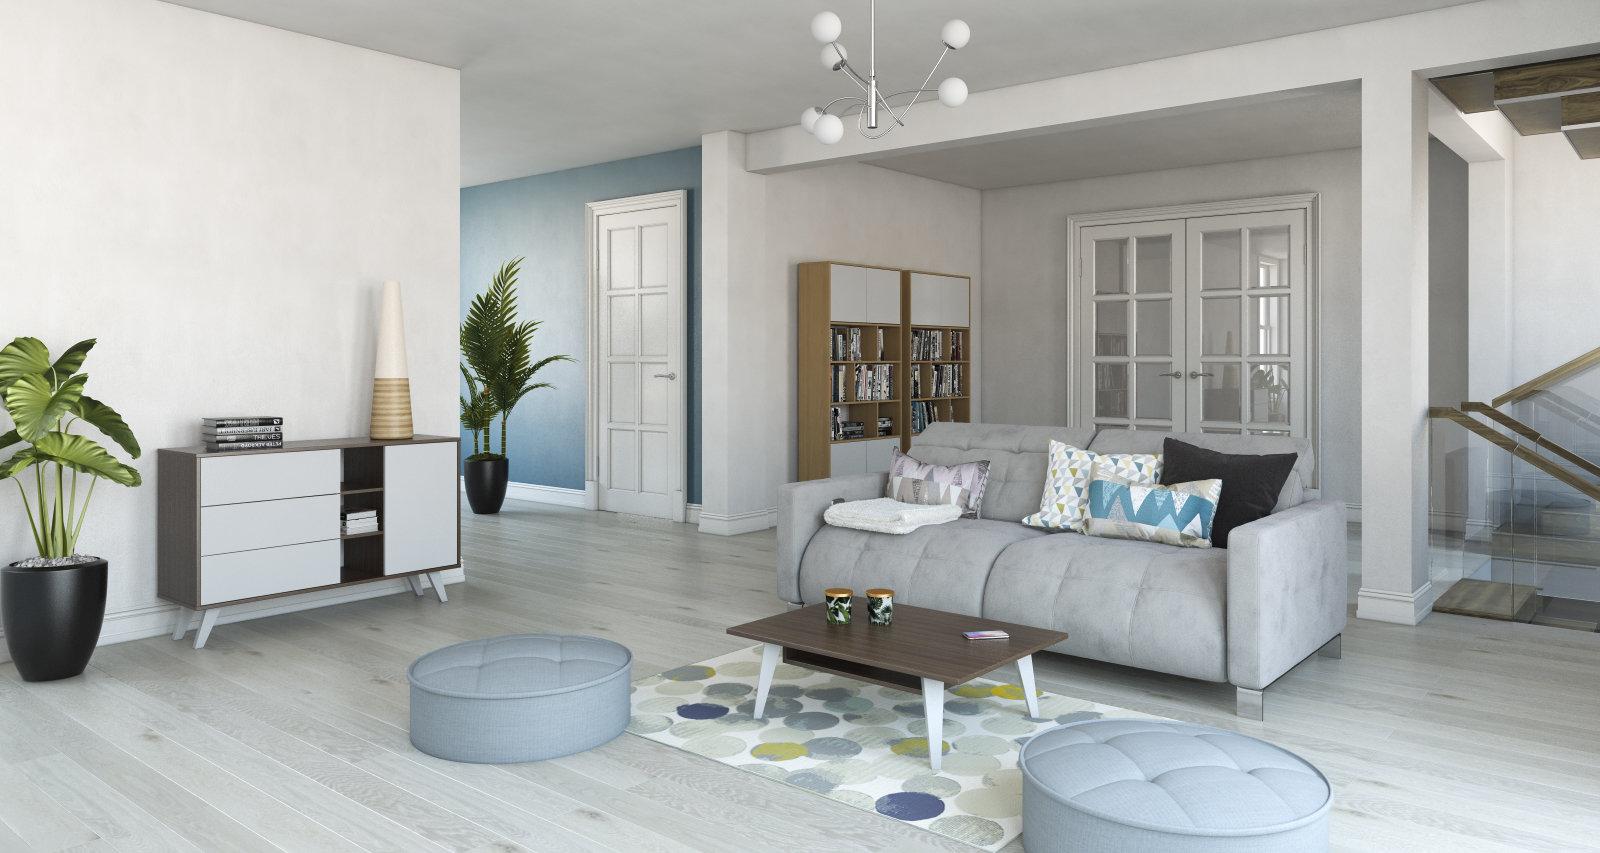 Salon scandinave beige blanc bleu: inspiration style Scandinave ...